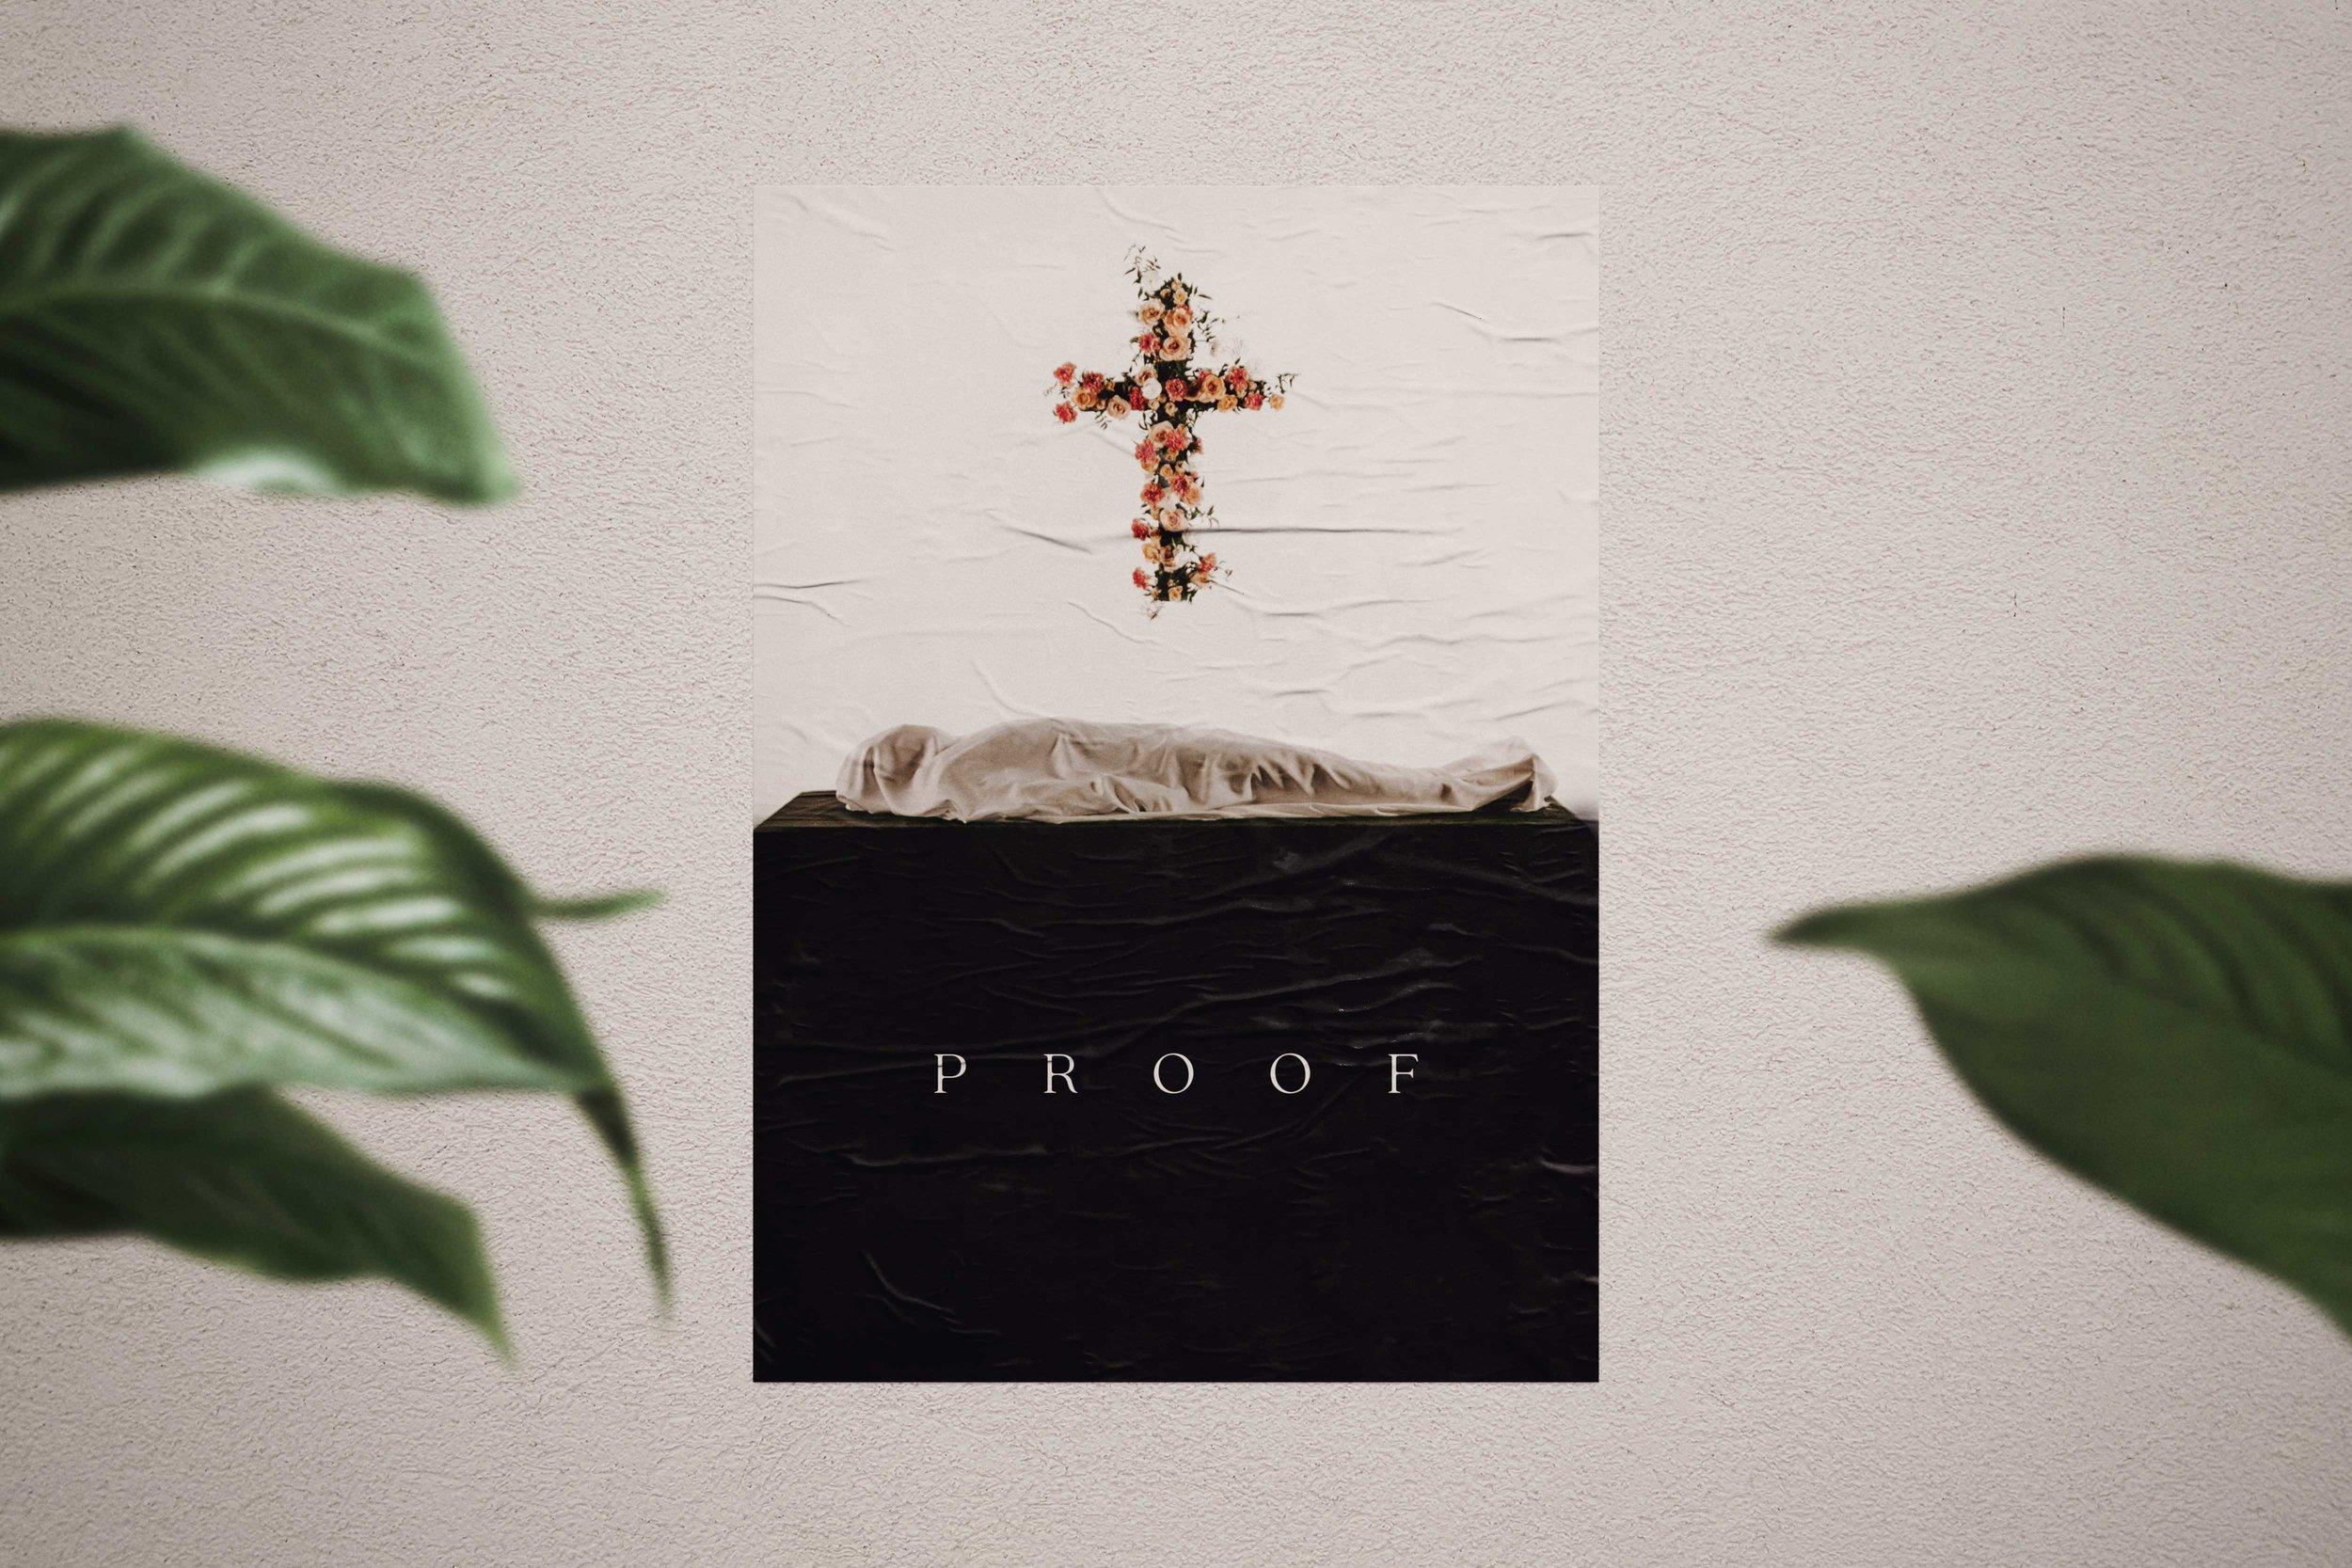 Dustin-Coble---DCoble_Proof2_WEB.jpg